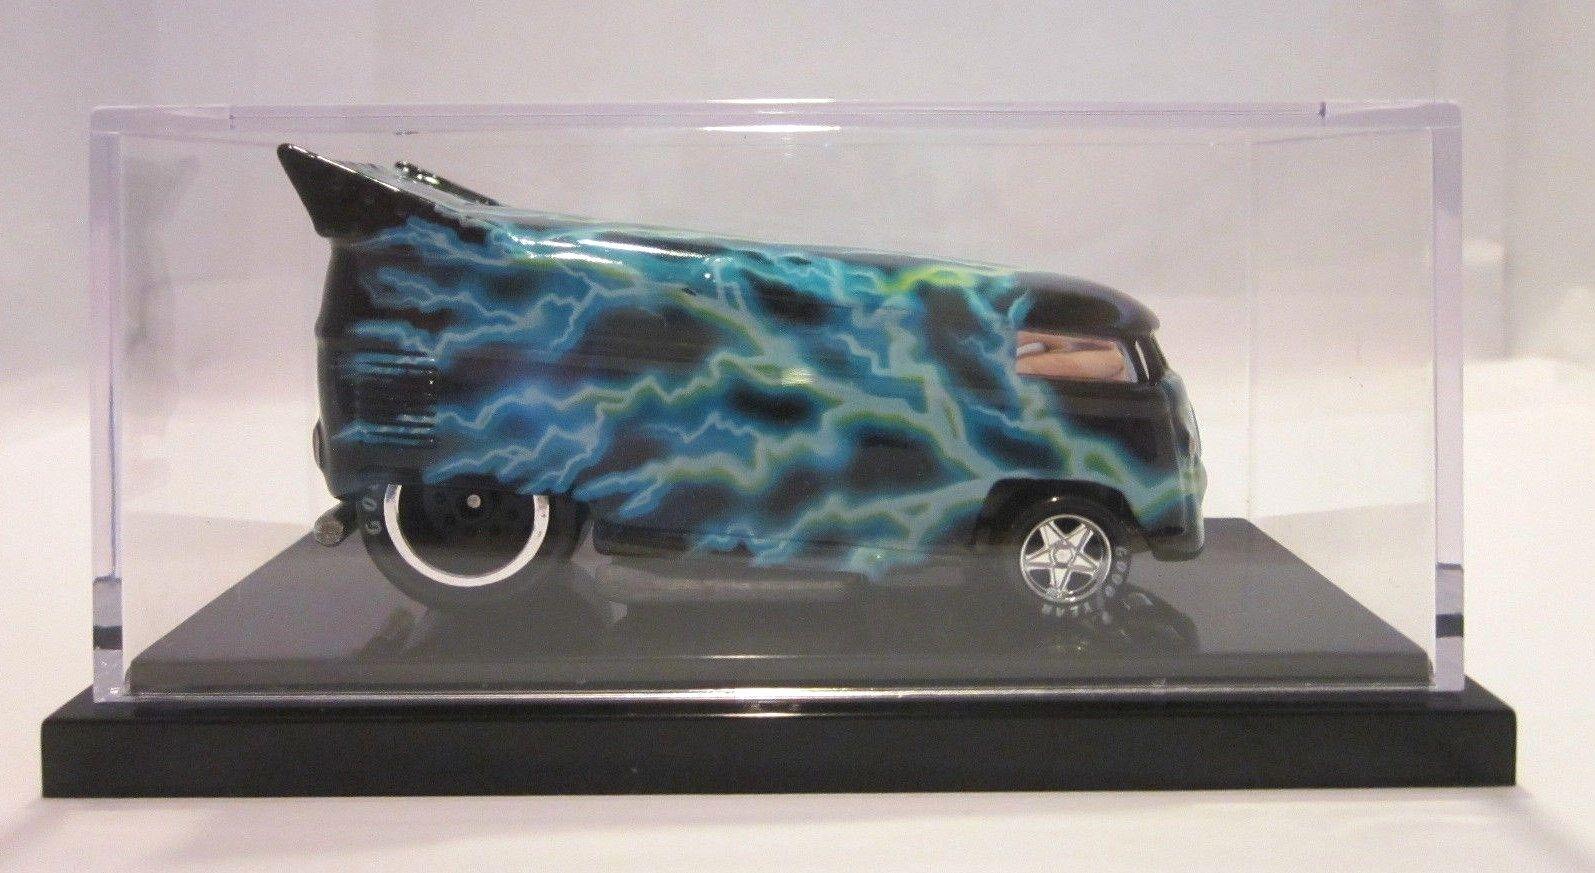 Hot Wheels Liberty Promotions-lightningwagon VW DRAG BUS Rebel Run - 89 de 200